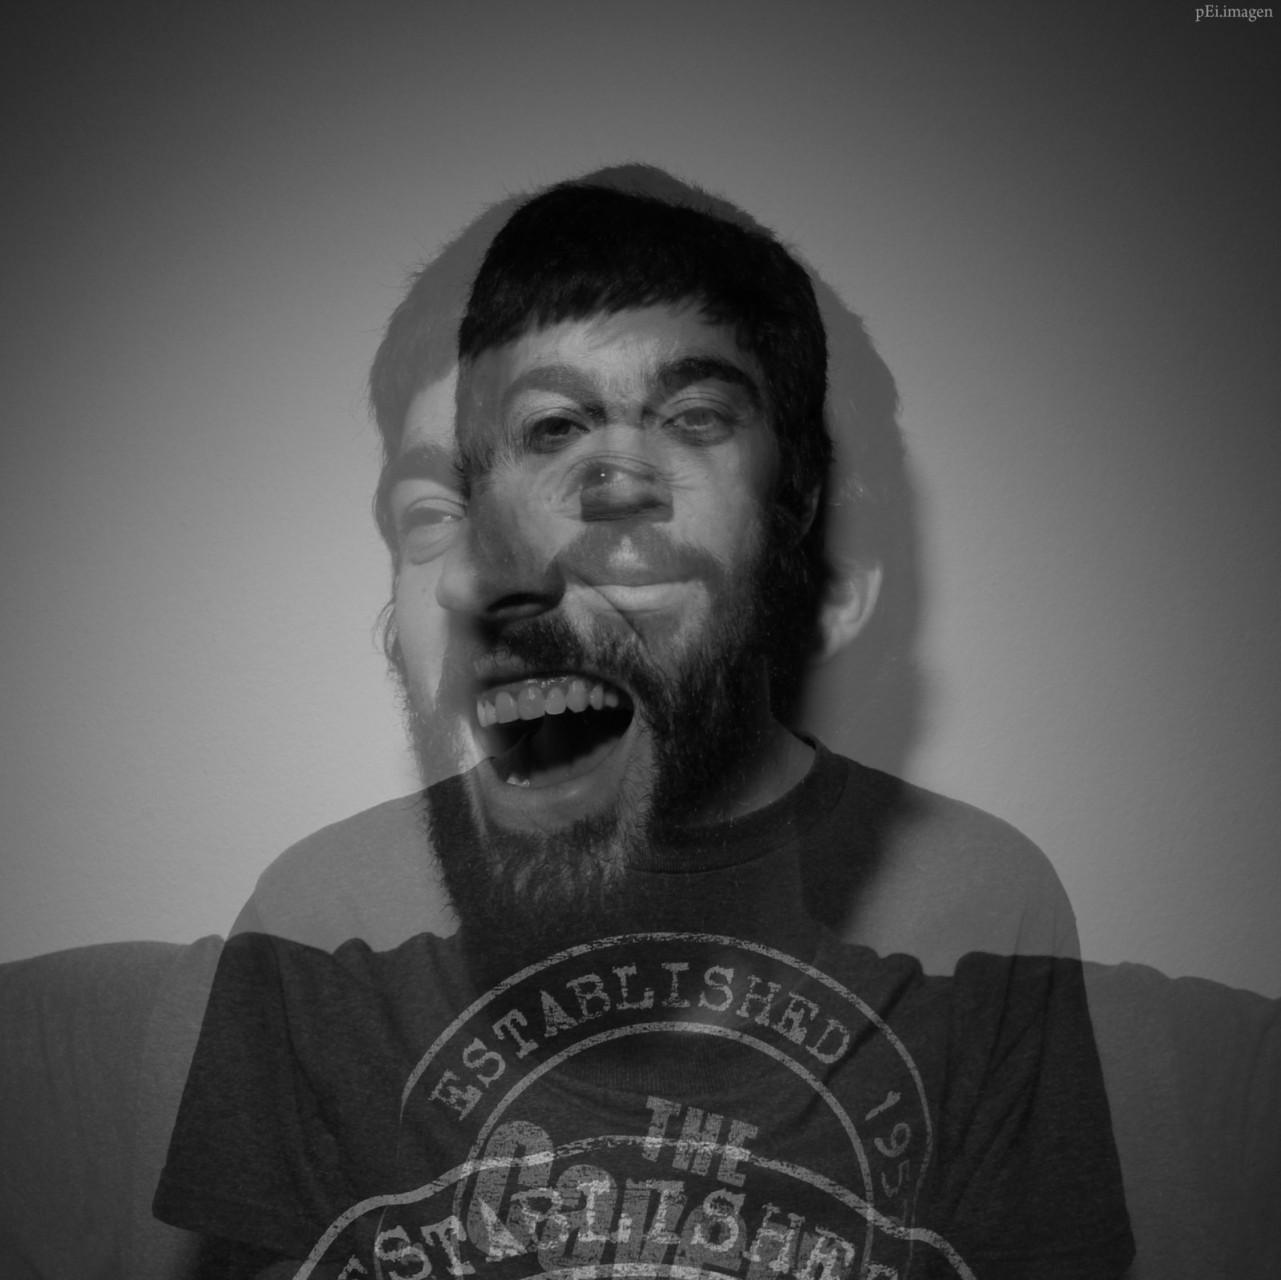 peipegata me myself I proyectos fotografia peipegatafotografia # 044 Cesar Gusano